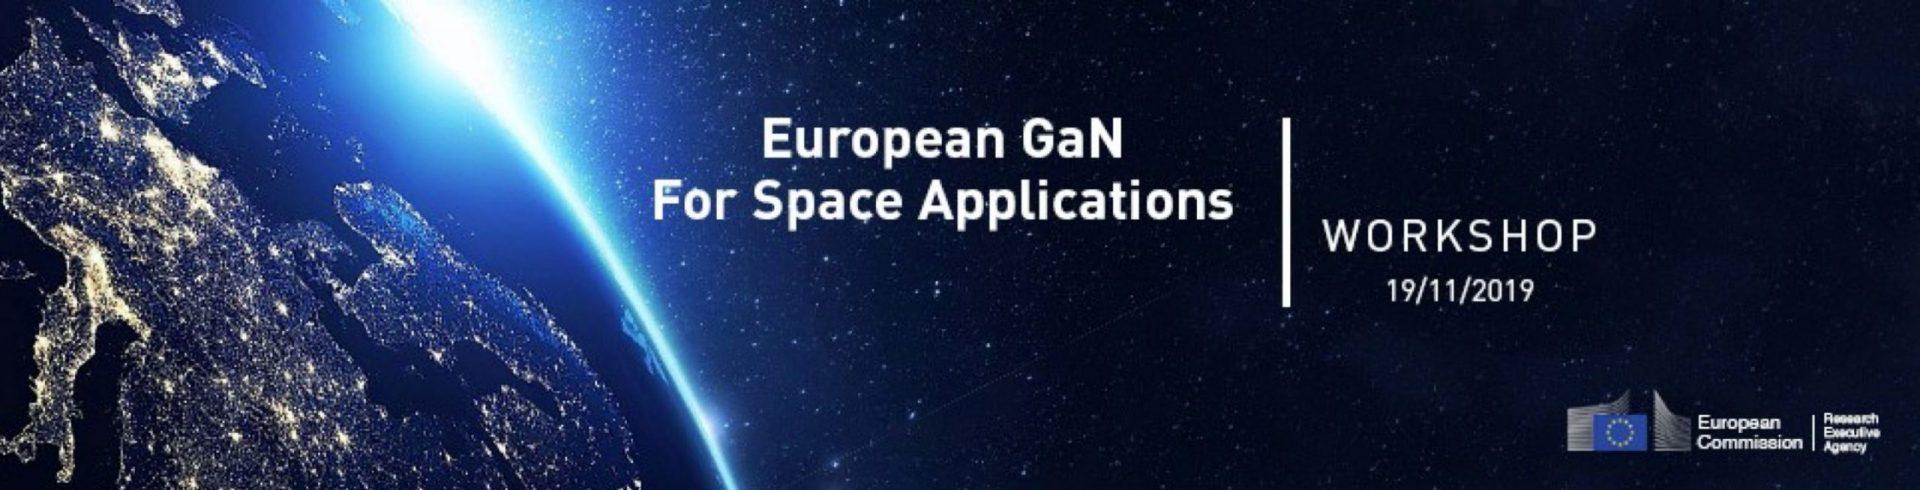 Heatpack at European GaN for Space Applications Workshop